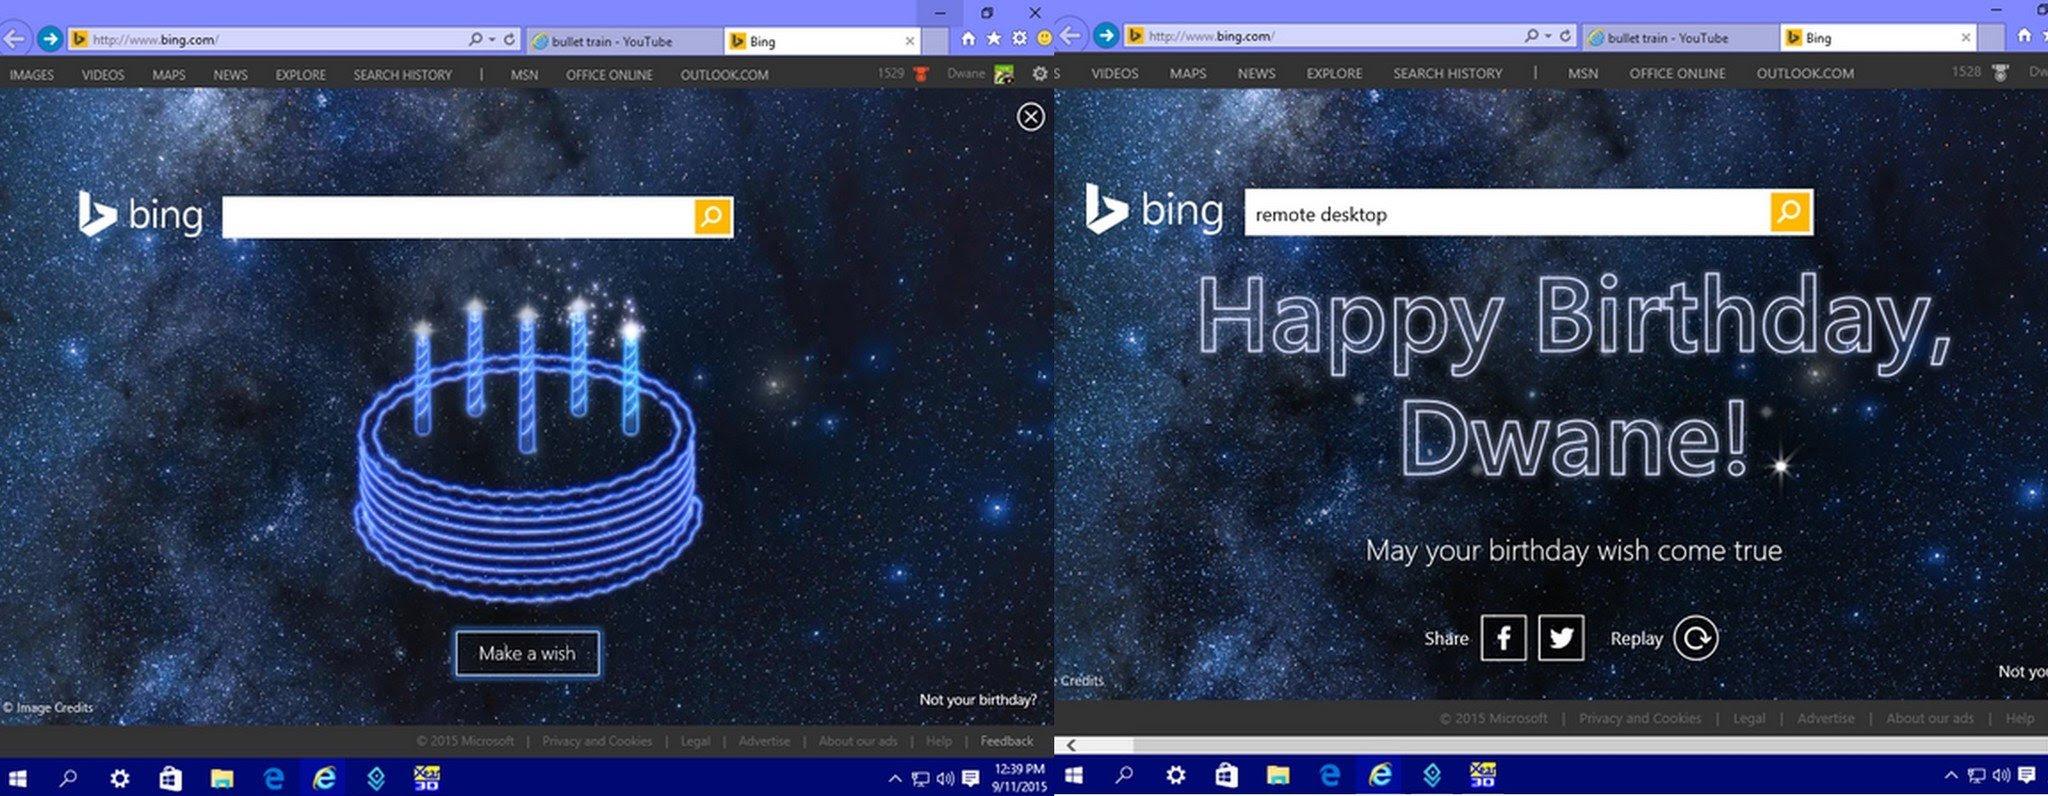 Bing Happy Birthday